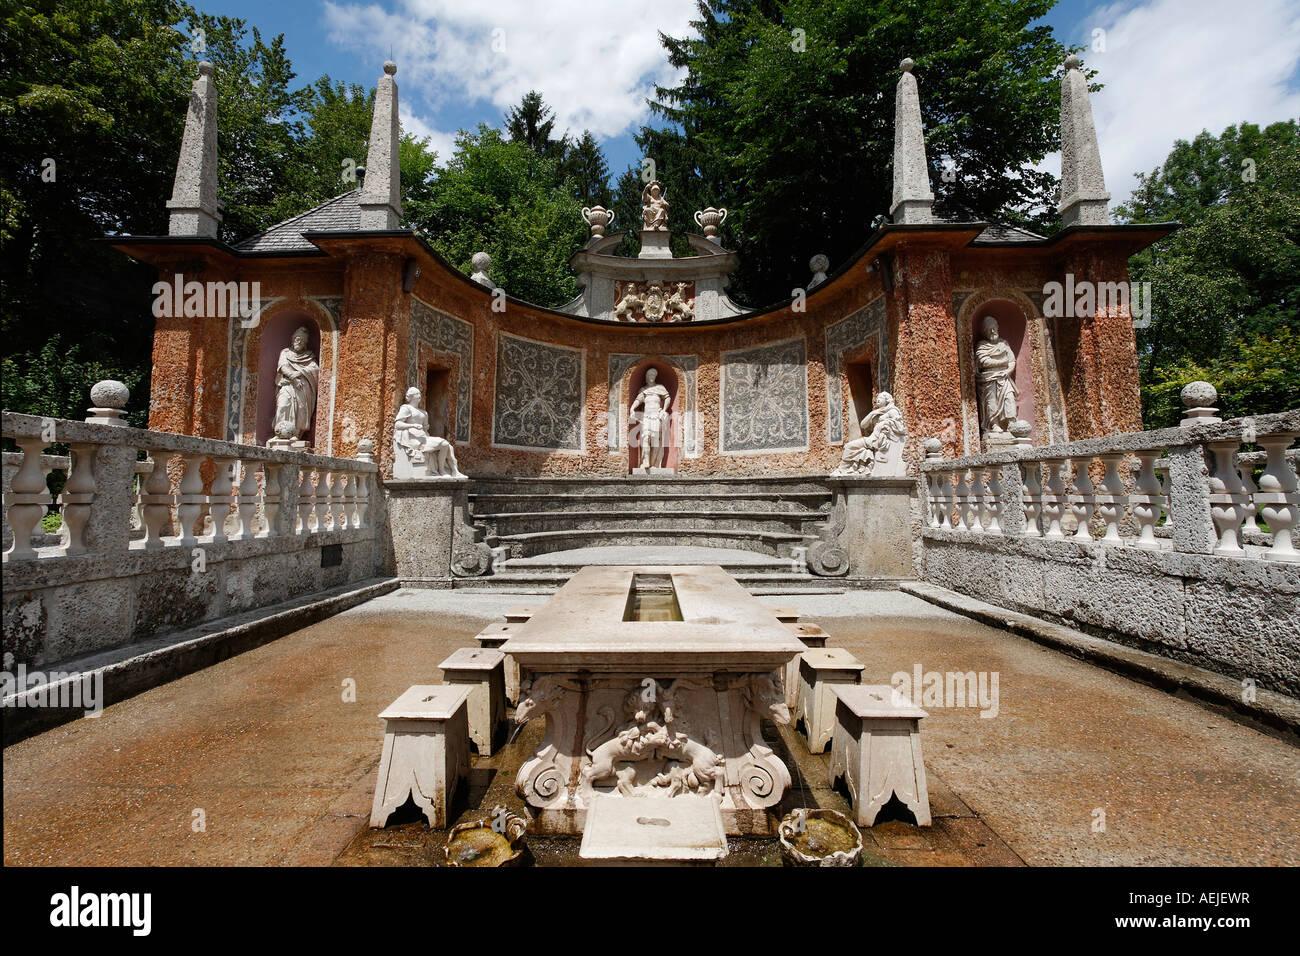 Trick fountains, table of the prince, Roman Theater, Hellbrunn, Salzburg, Austria Stock Photo